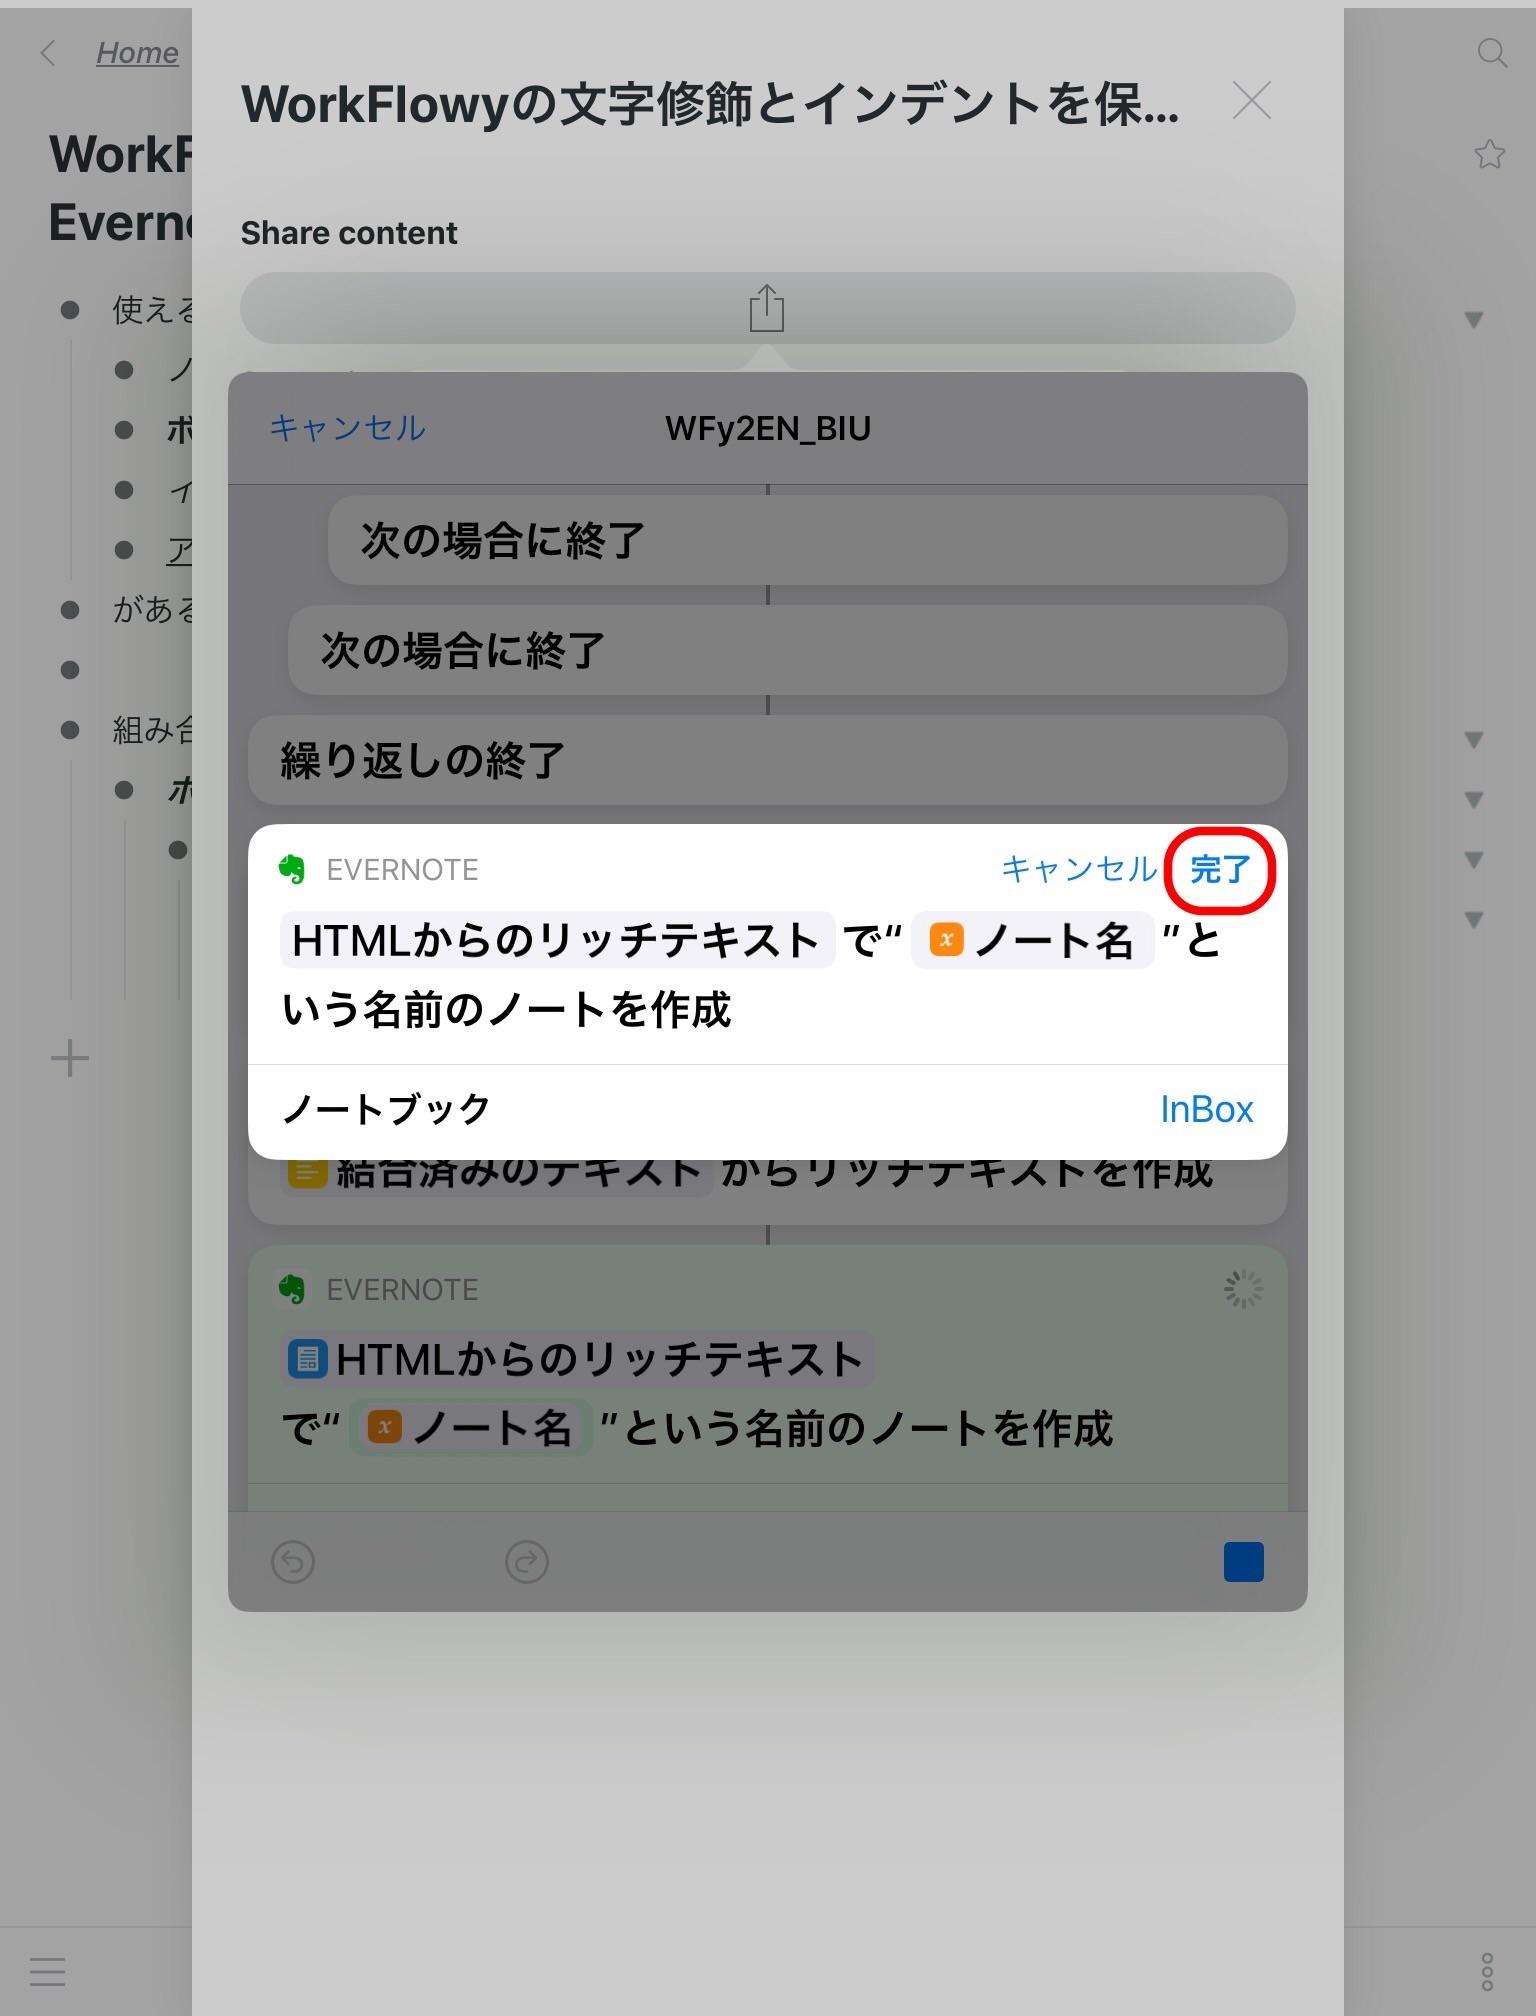 f:id:sorashima:20200731233330j:plain:w637